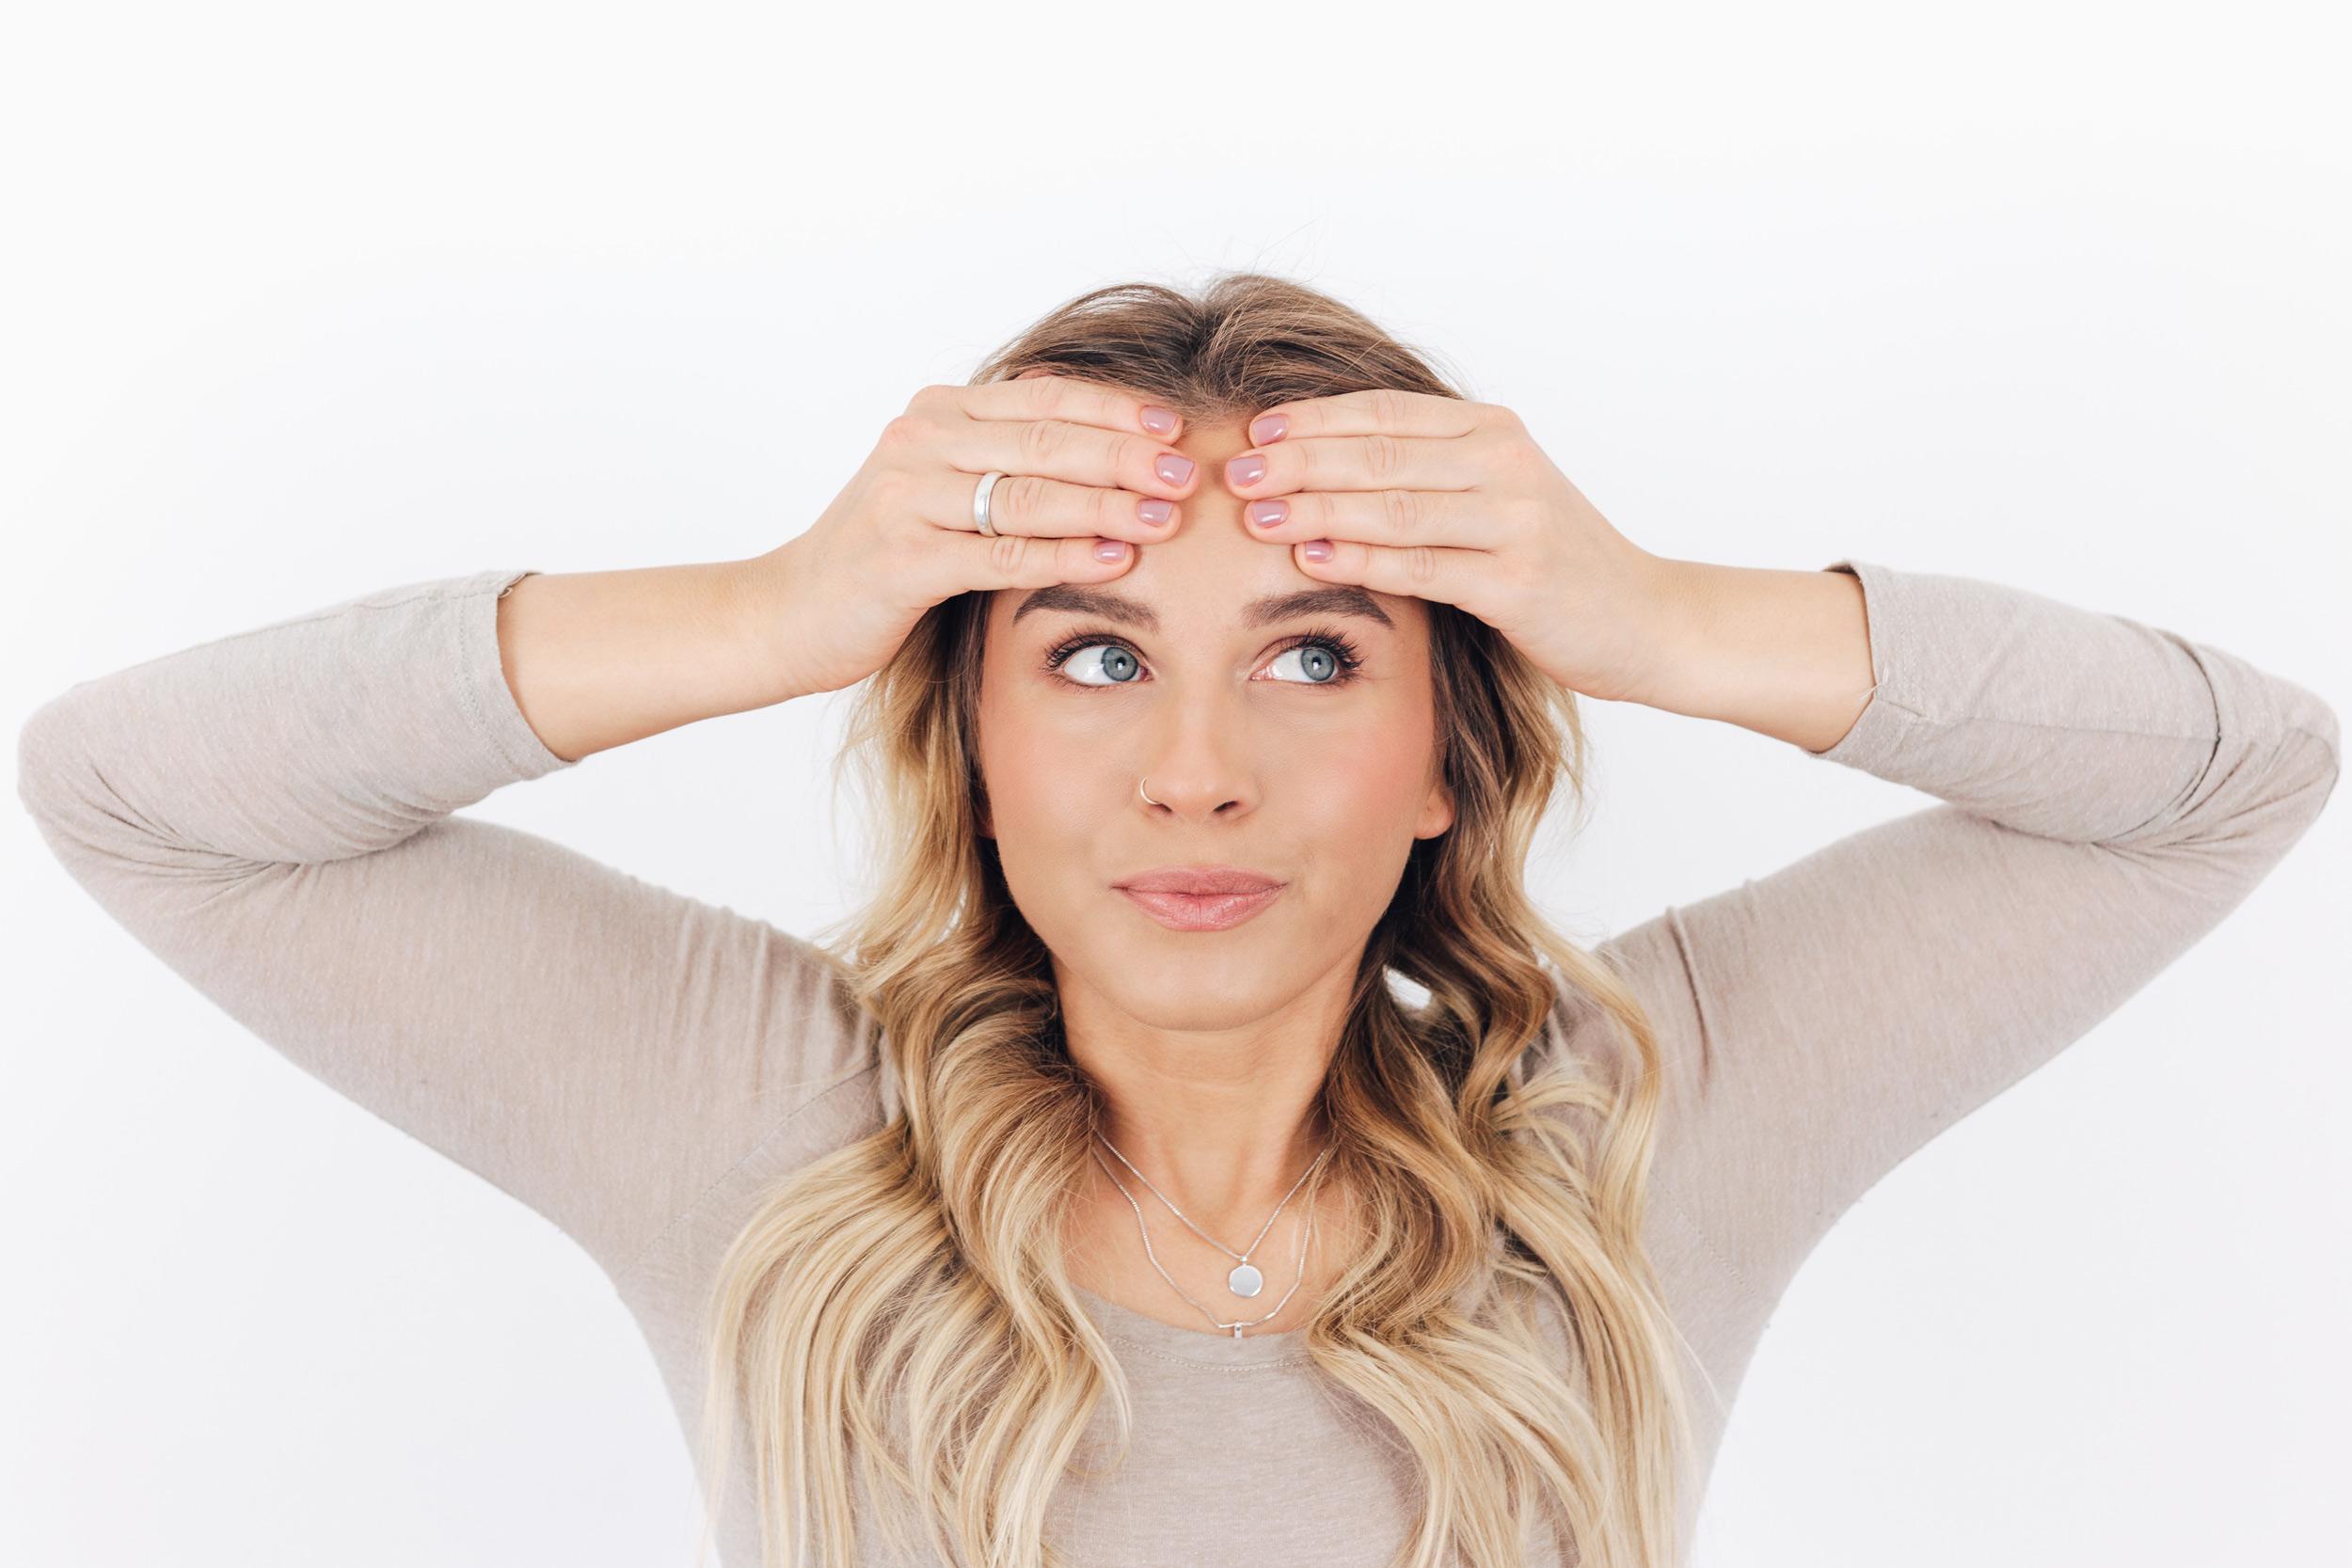 schaebens-nelas-beautytipps-face-yoga-position